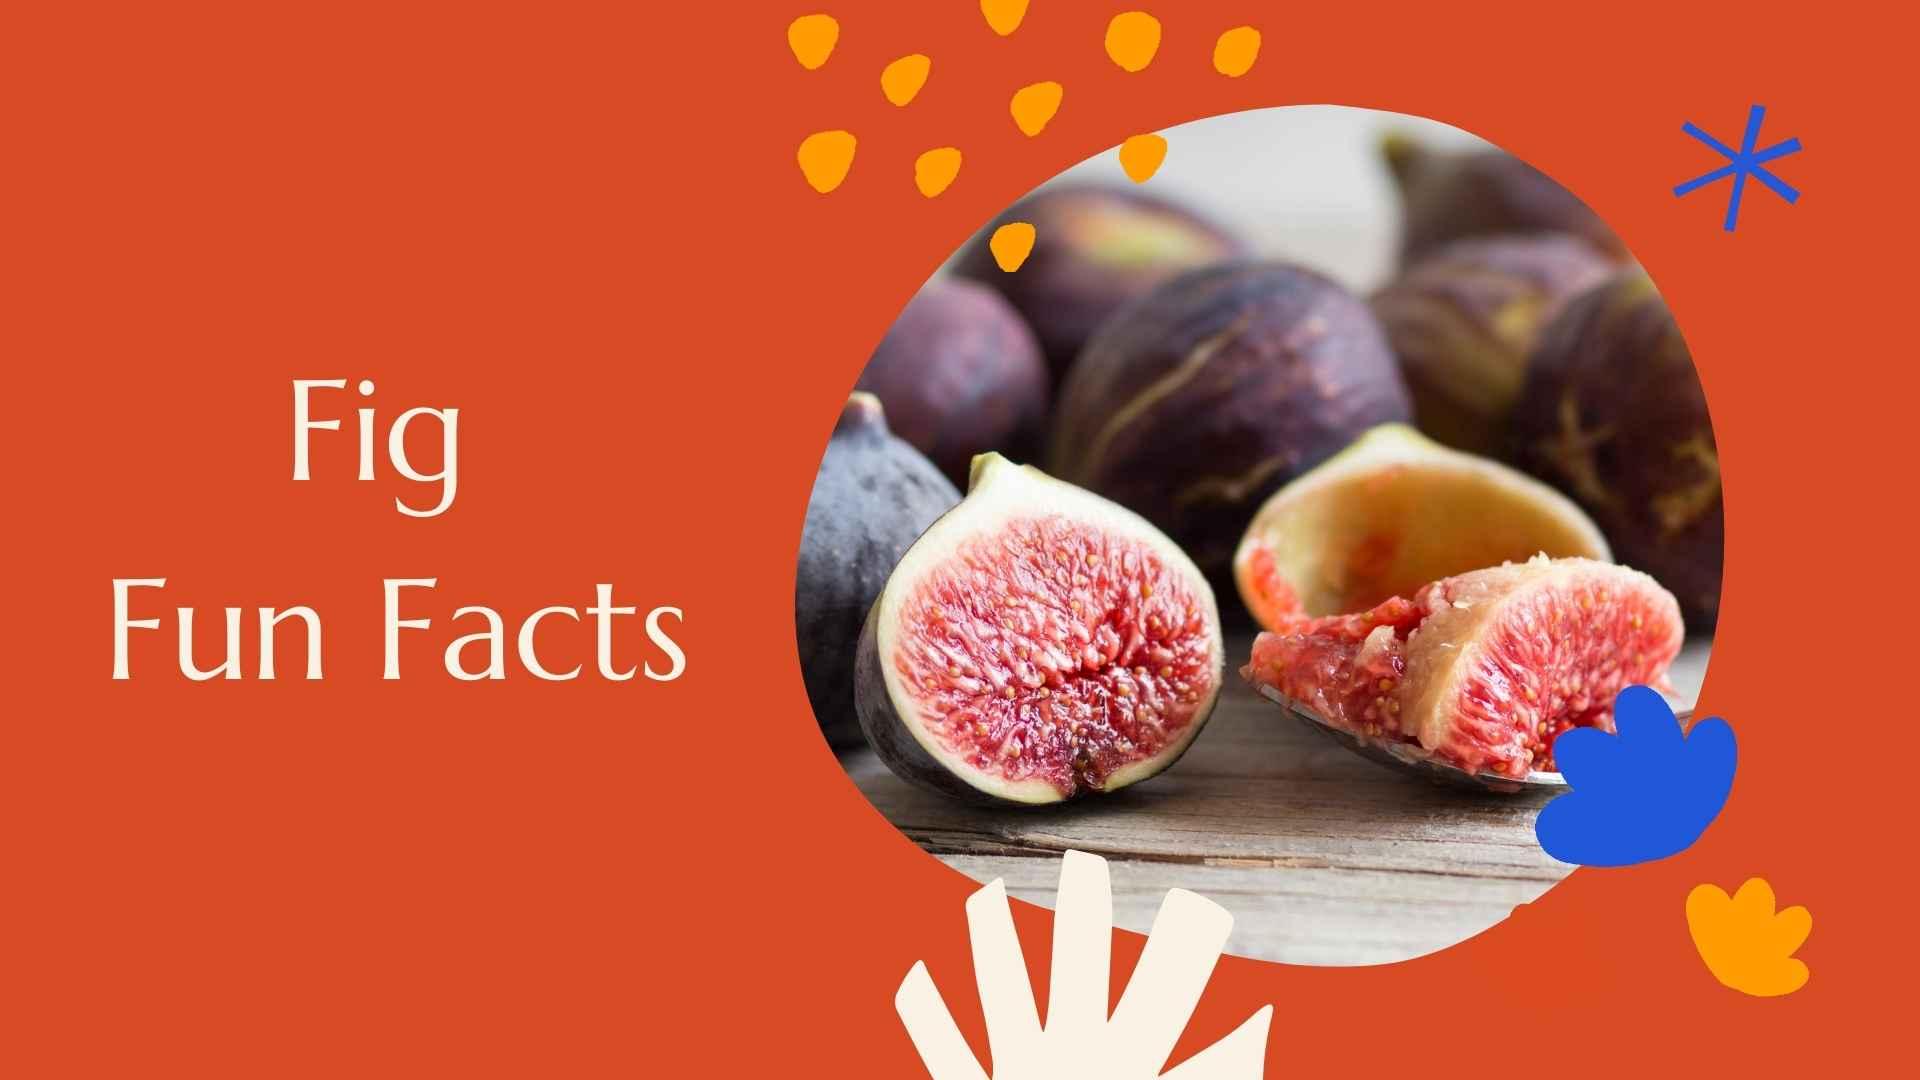 fig fun facts